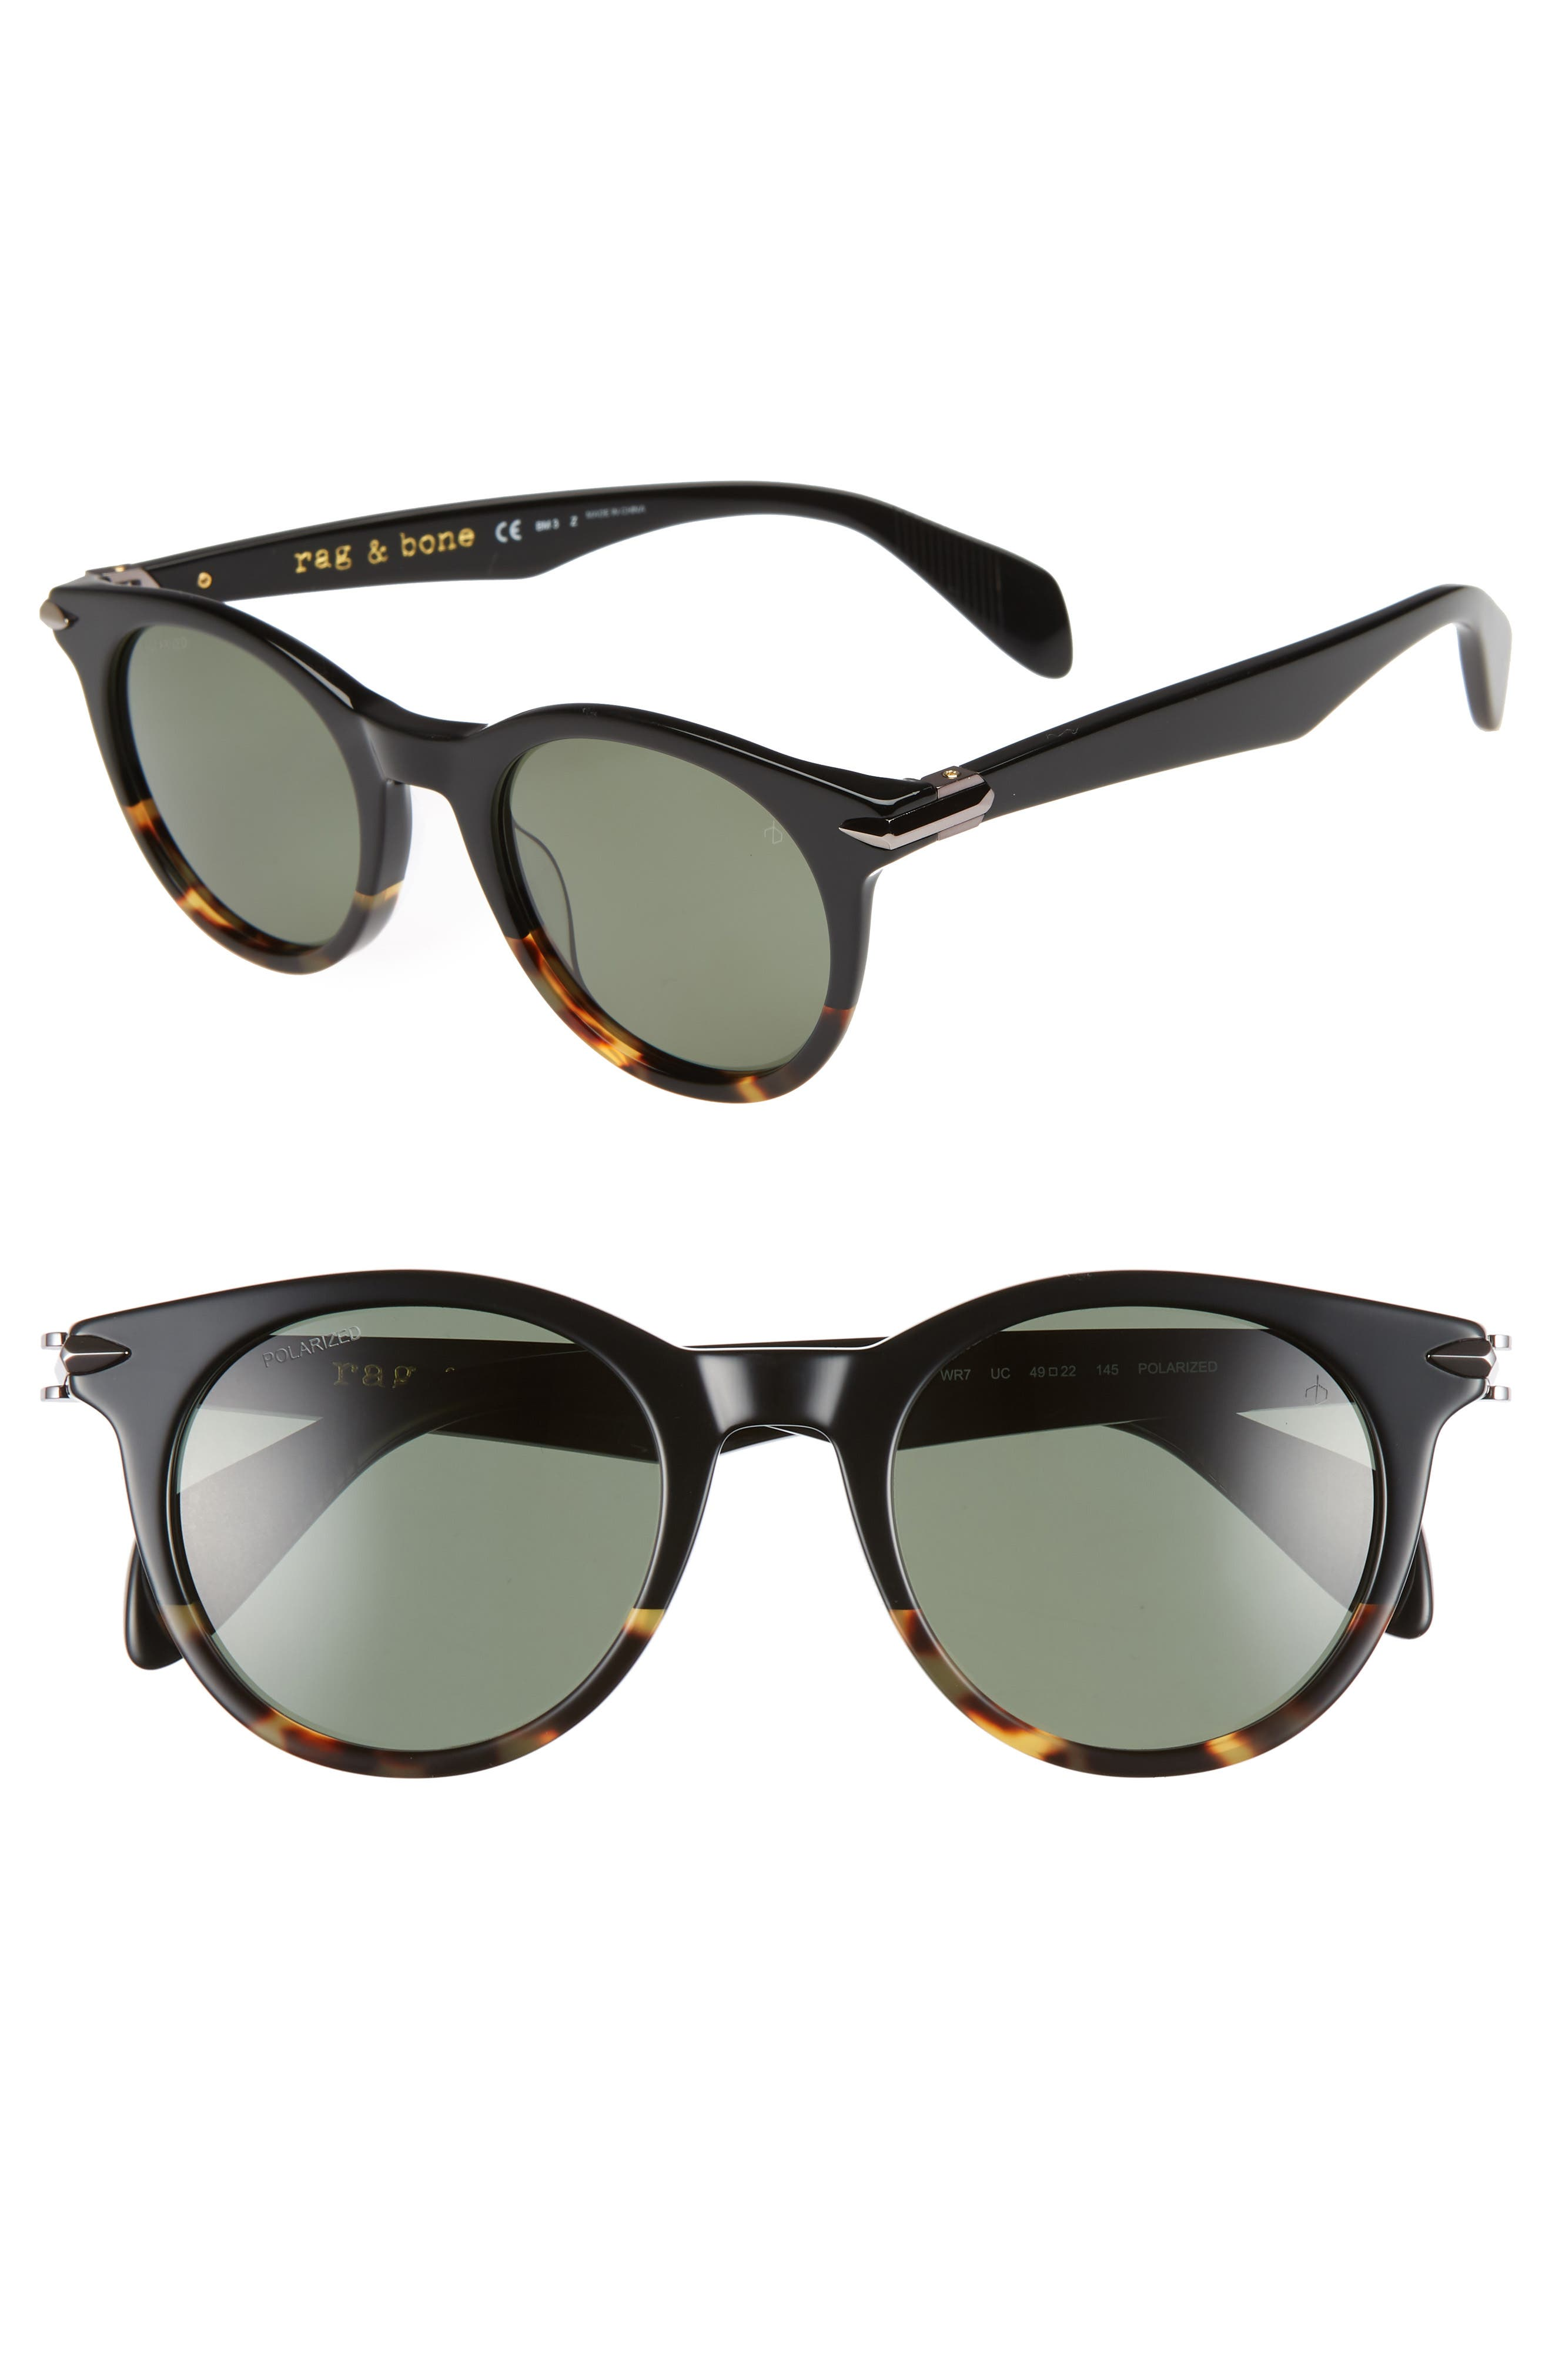 35de8a288287 Rag & Bone 4m Polarized Round Sunglasses - Black Havana